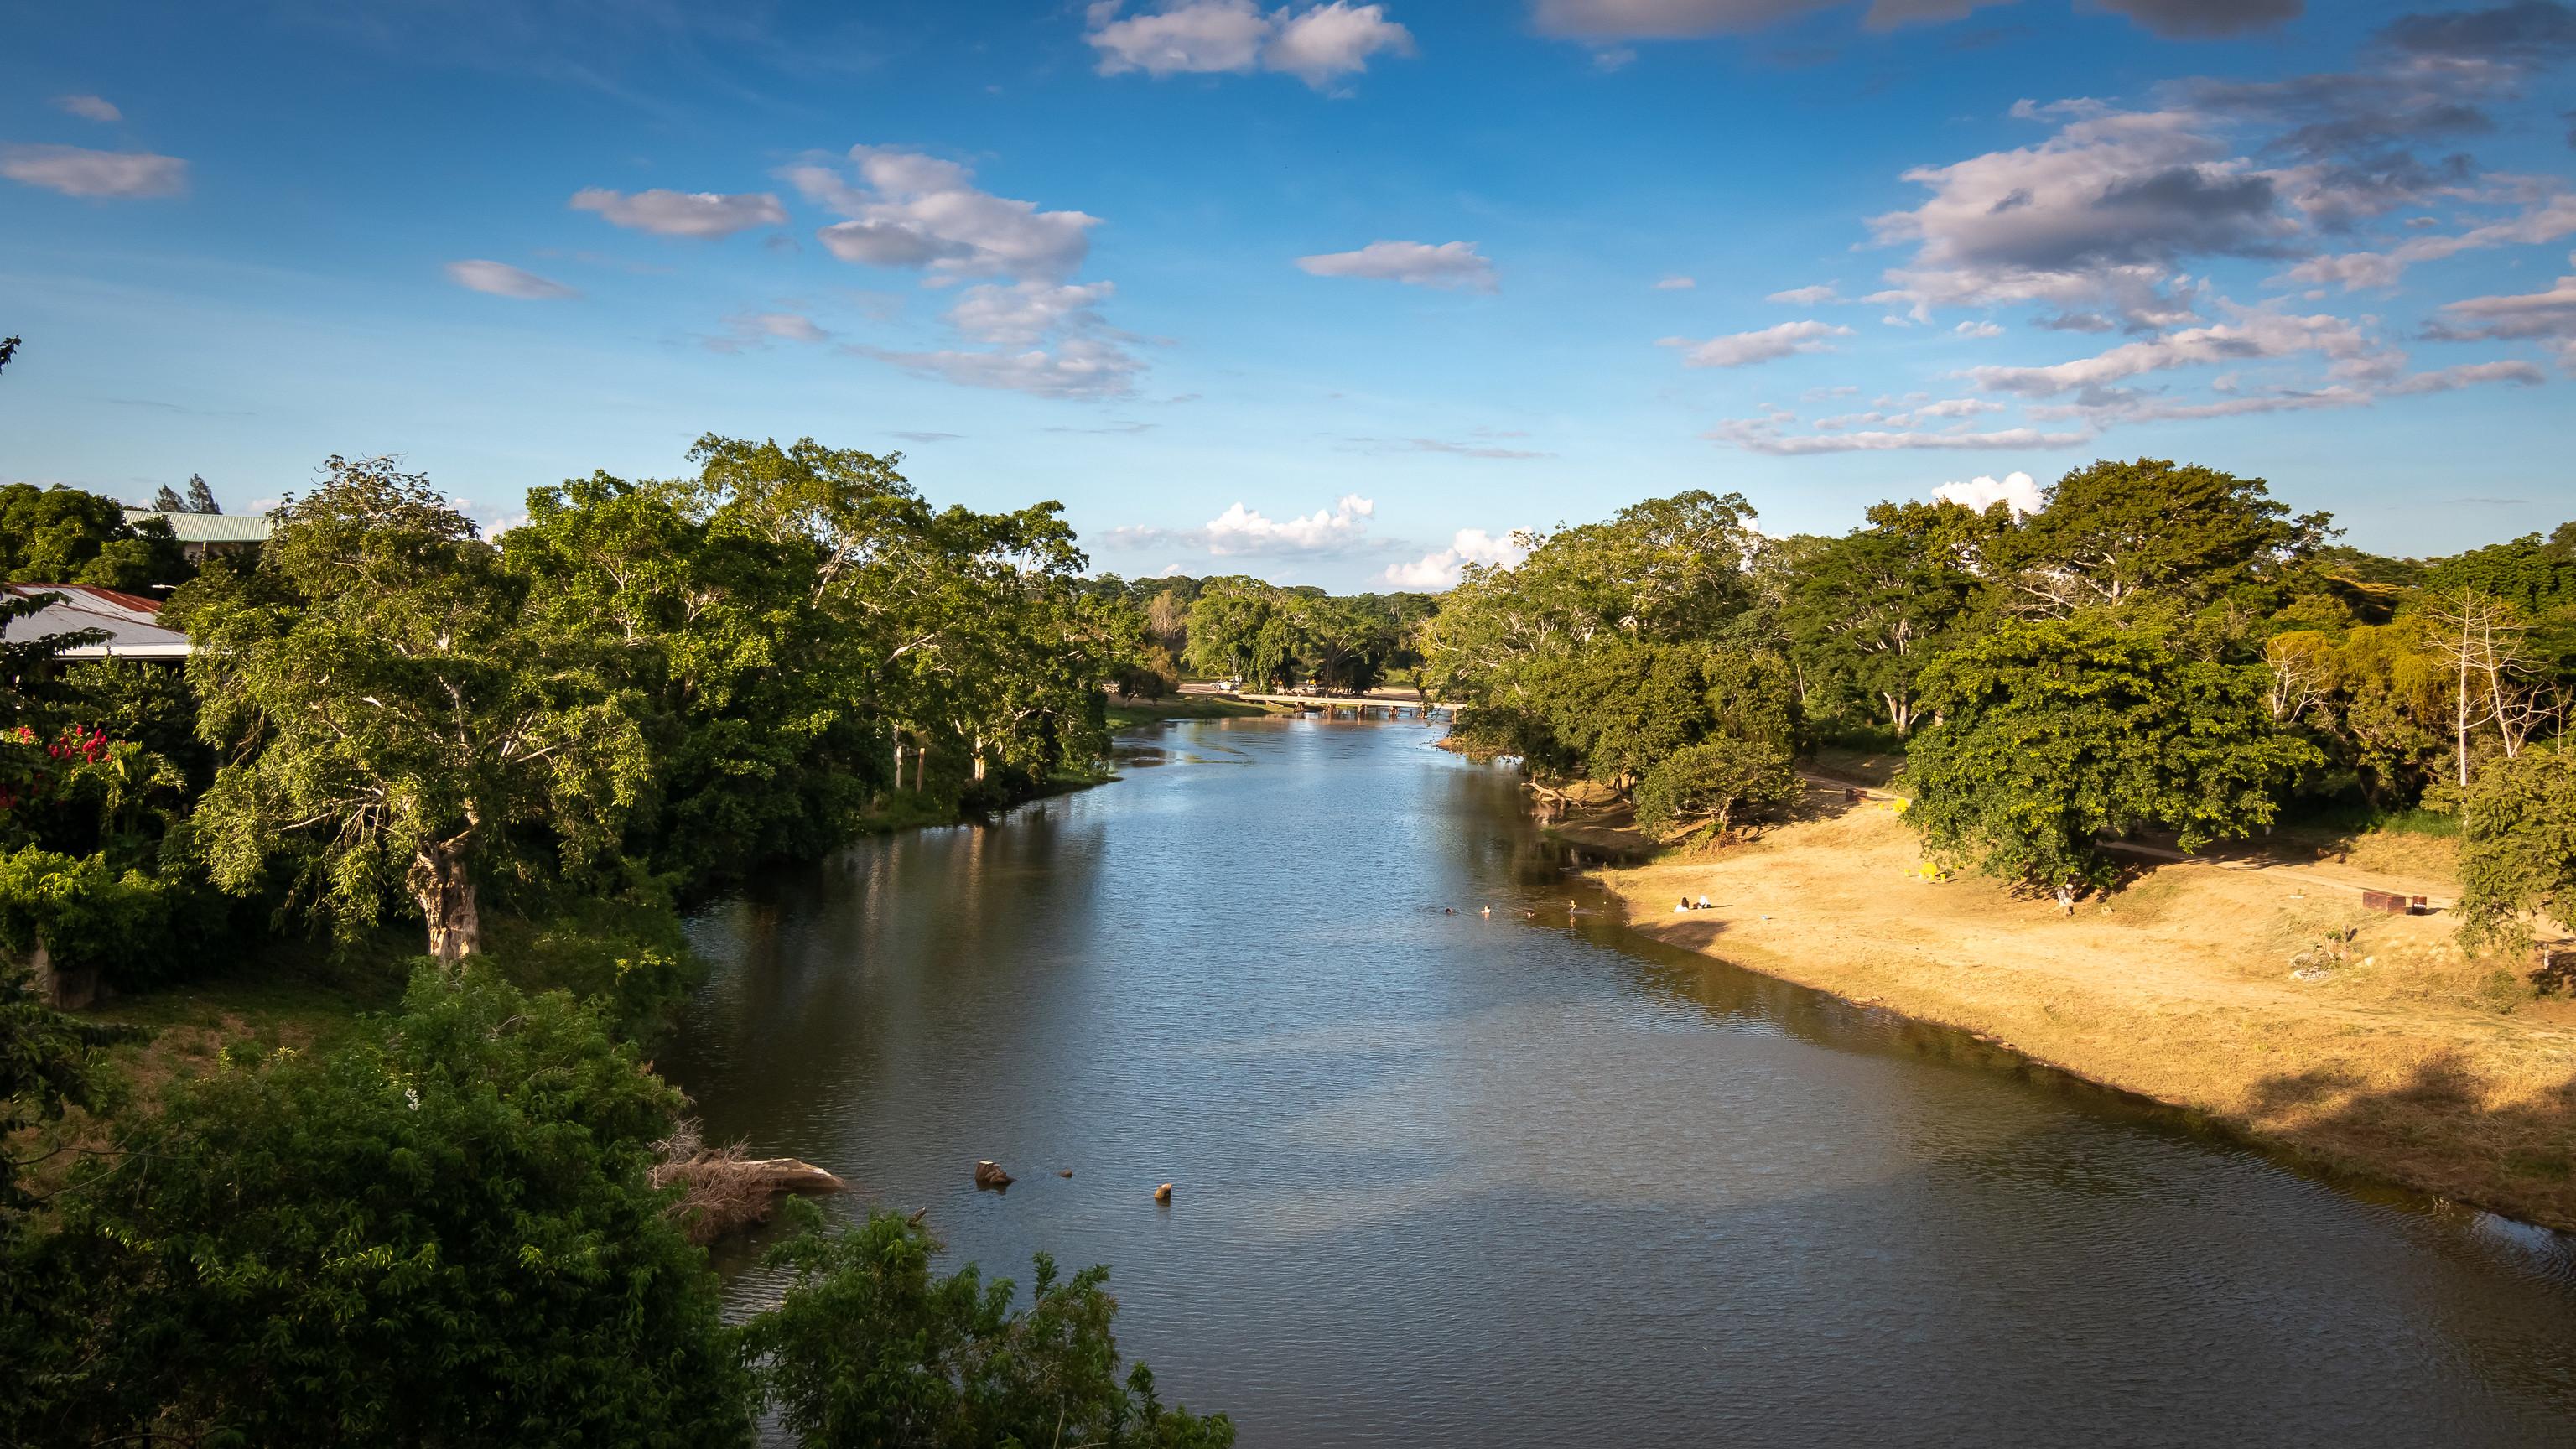 San Ignacio - [Belize]